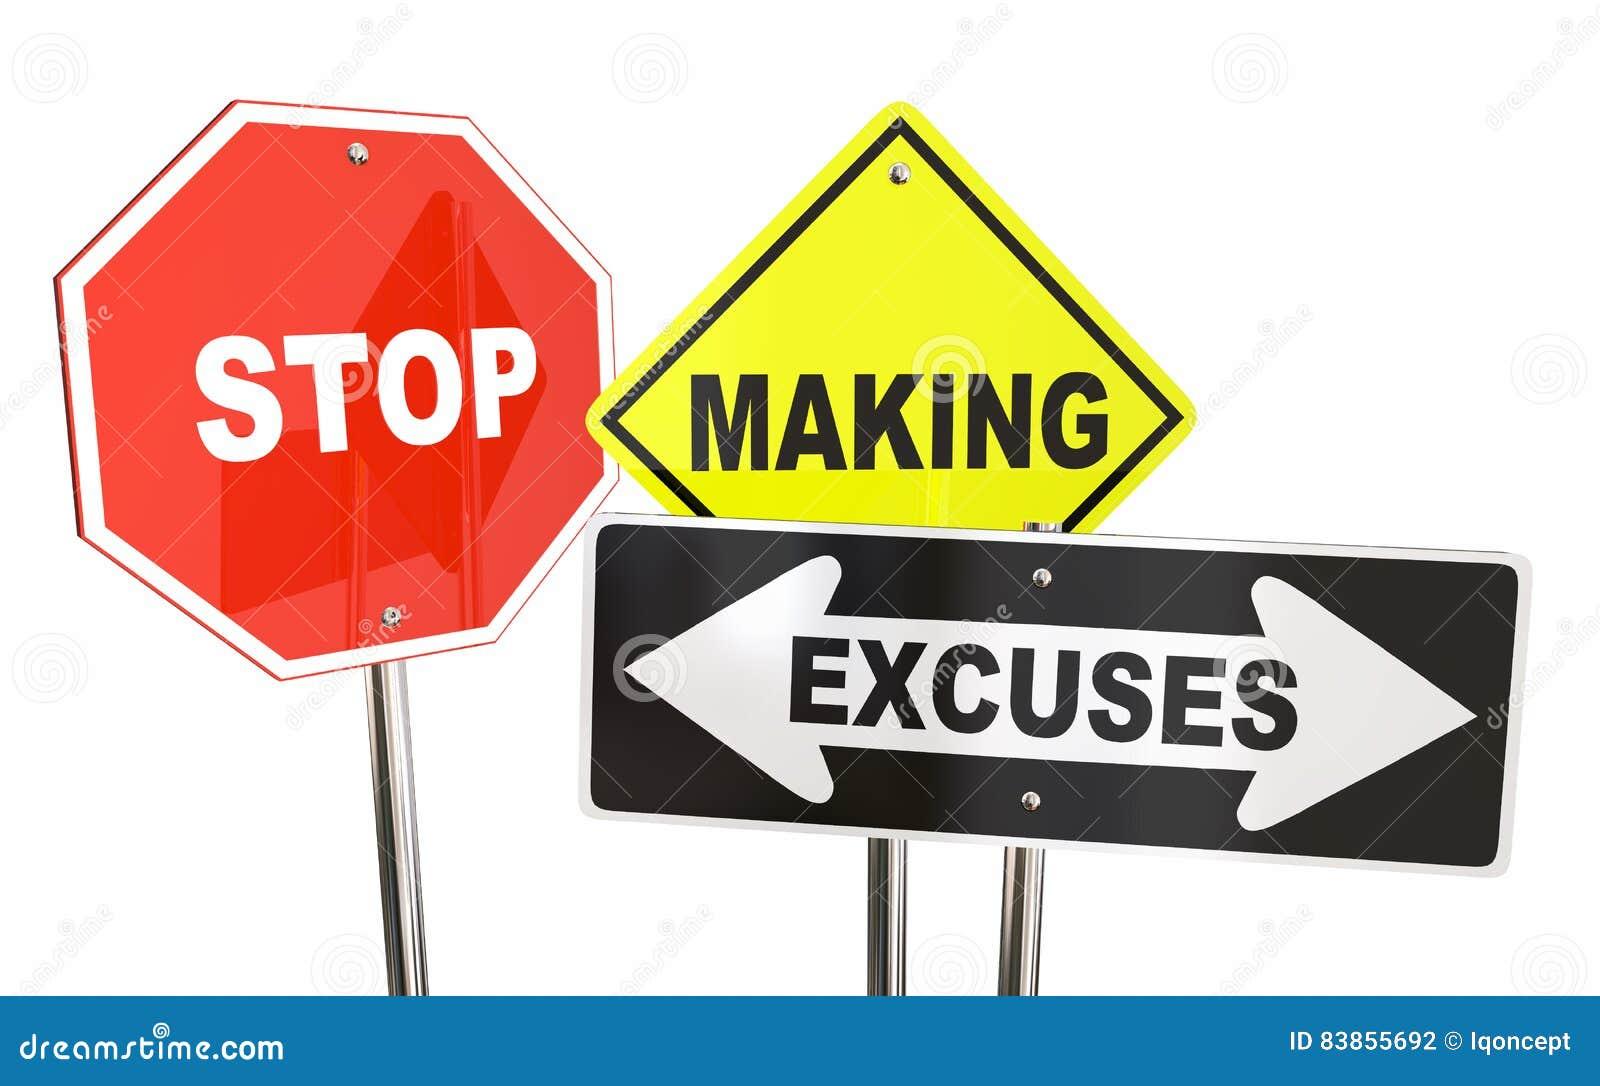 Stop Making Excuses Reasons Warning Signs